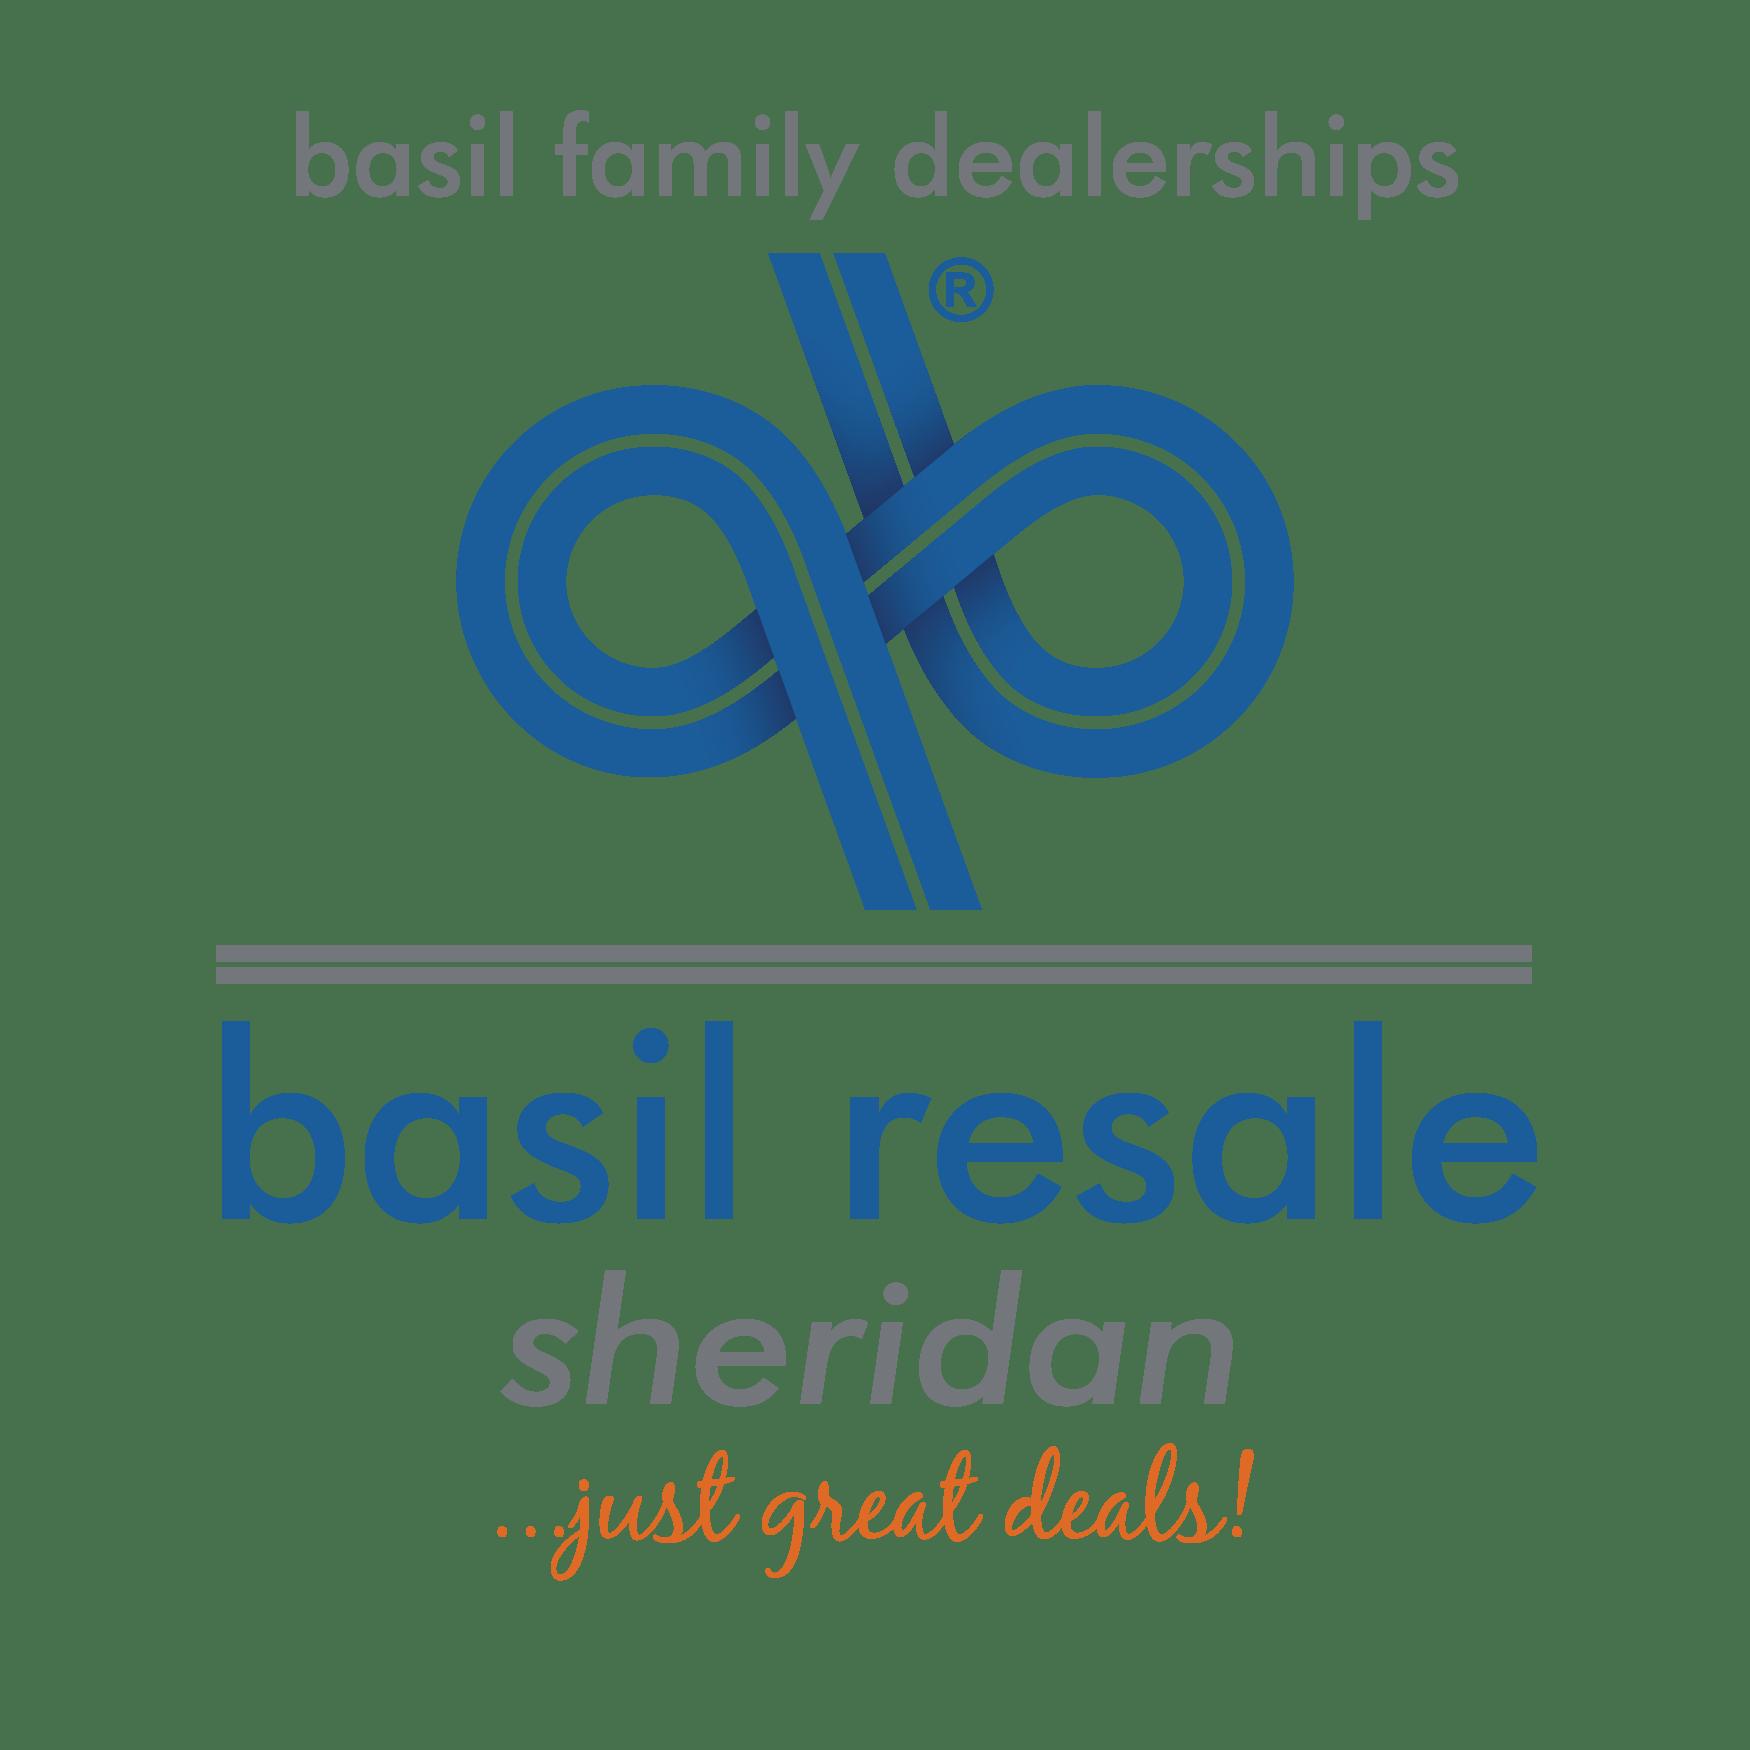 Basil Resale Sheridan Assets Basil Resale Sheridan